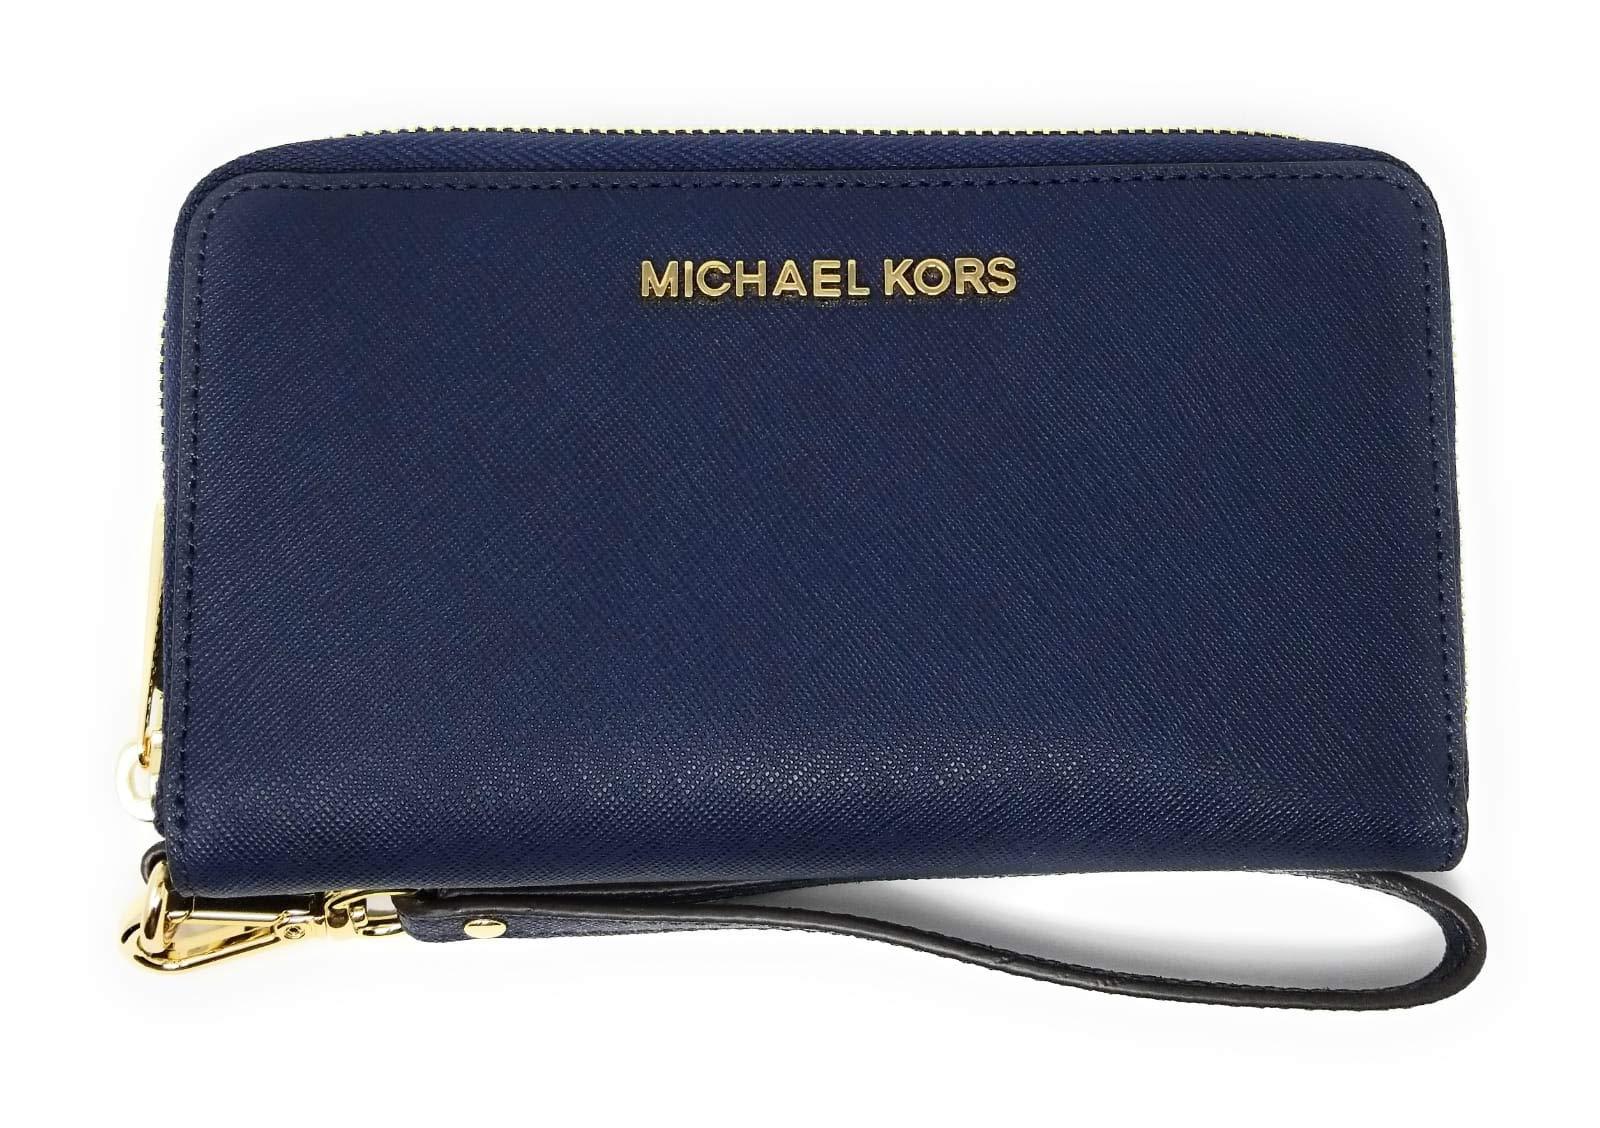 Michael Kors Women's Jet Set Travel Large Smartphone Wristlet (Navy)